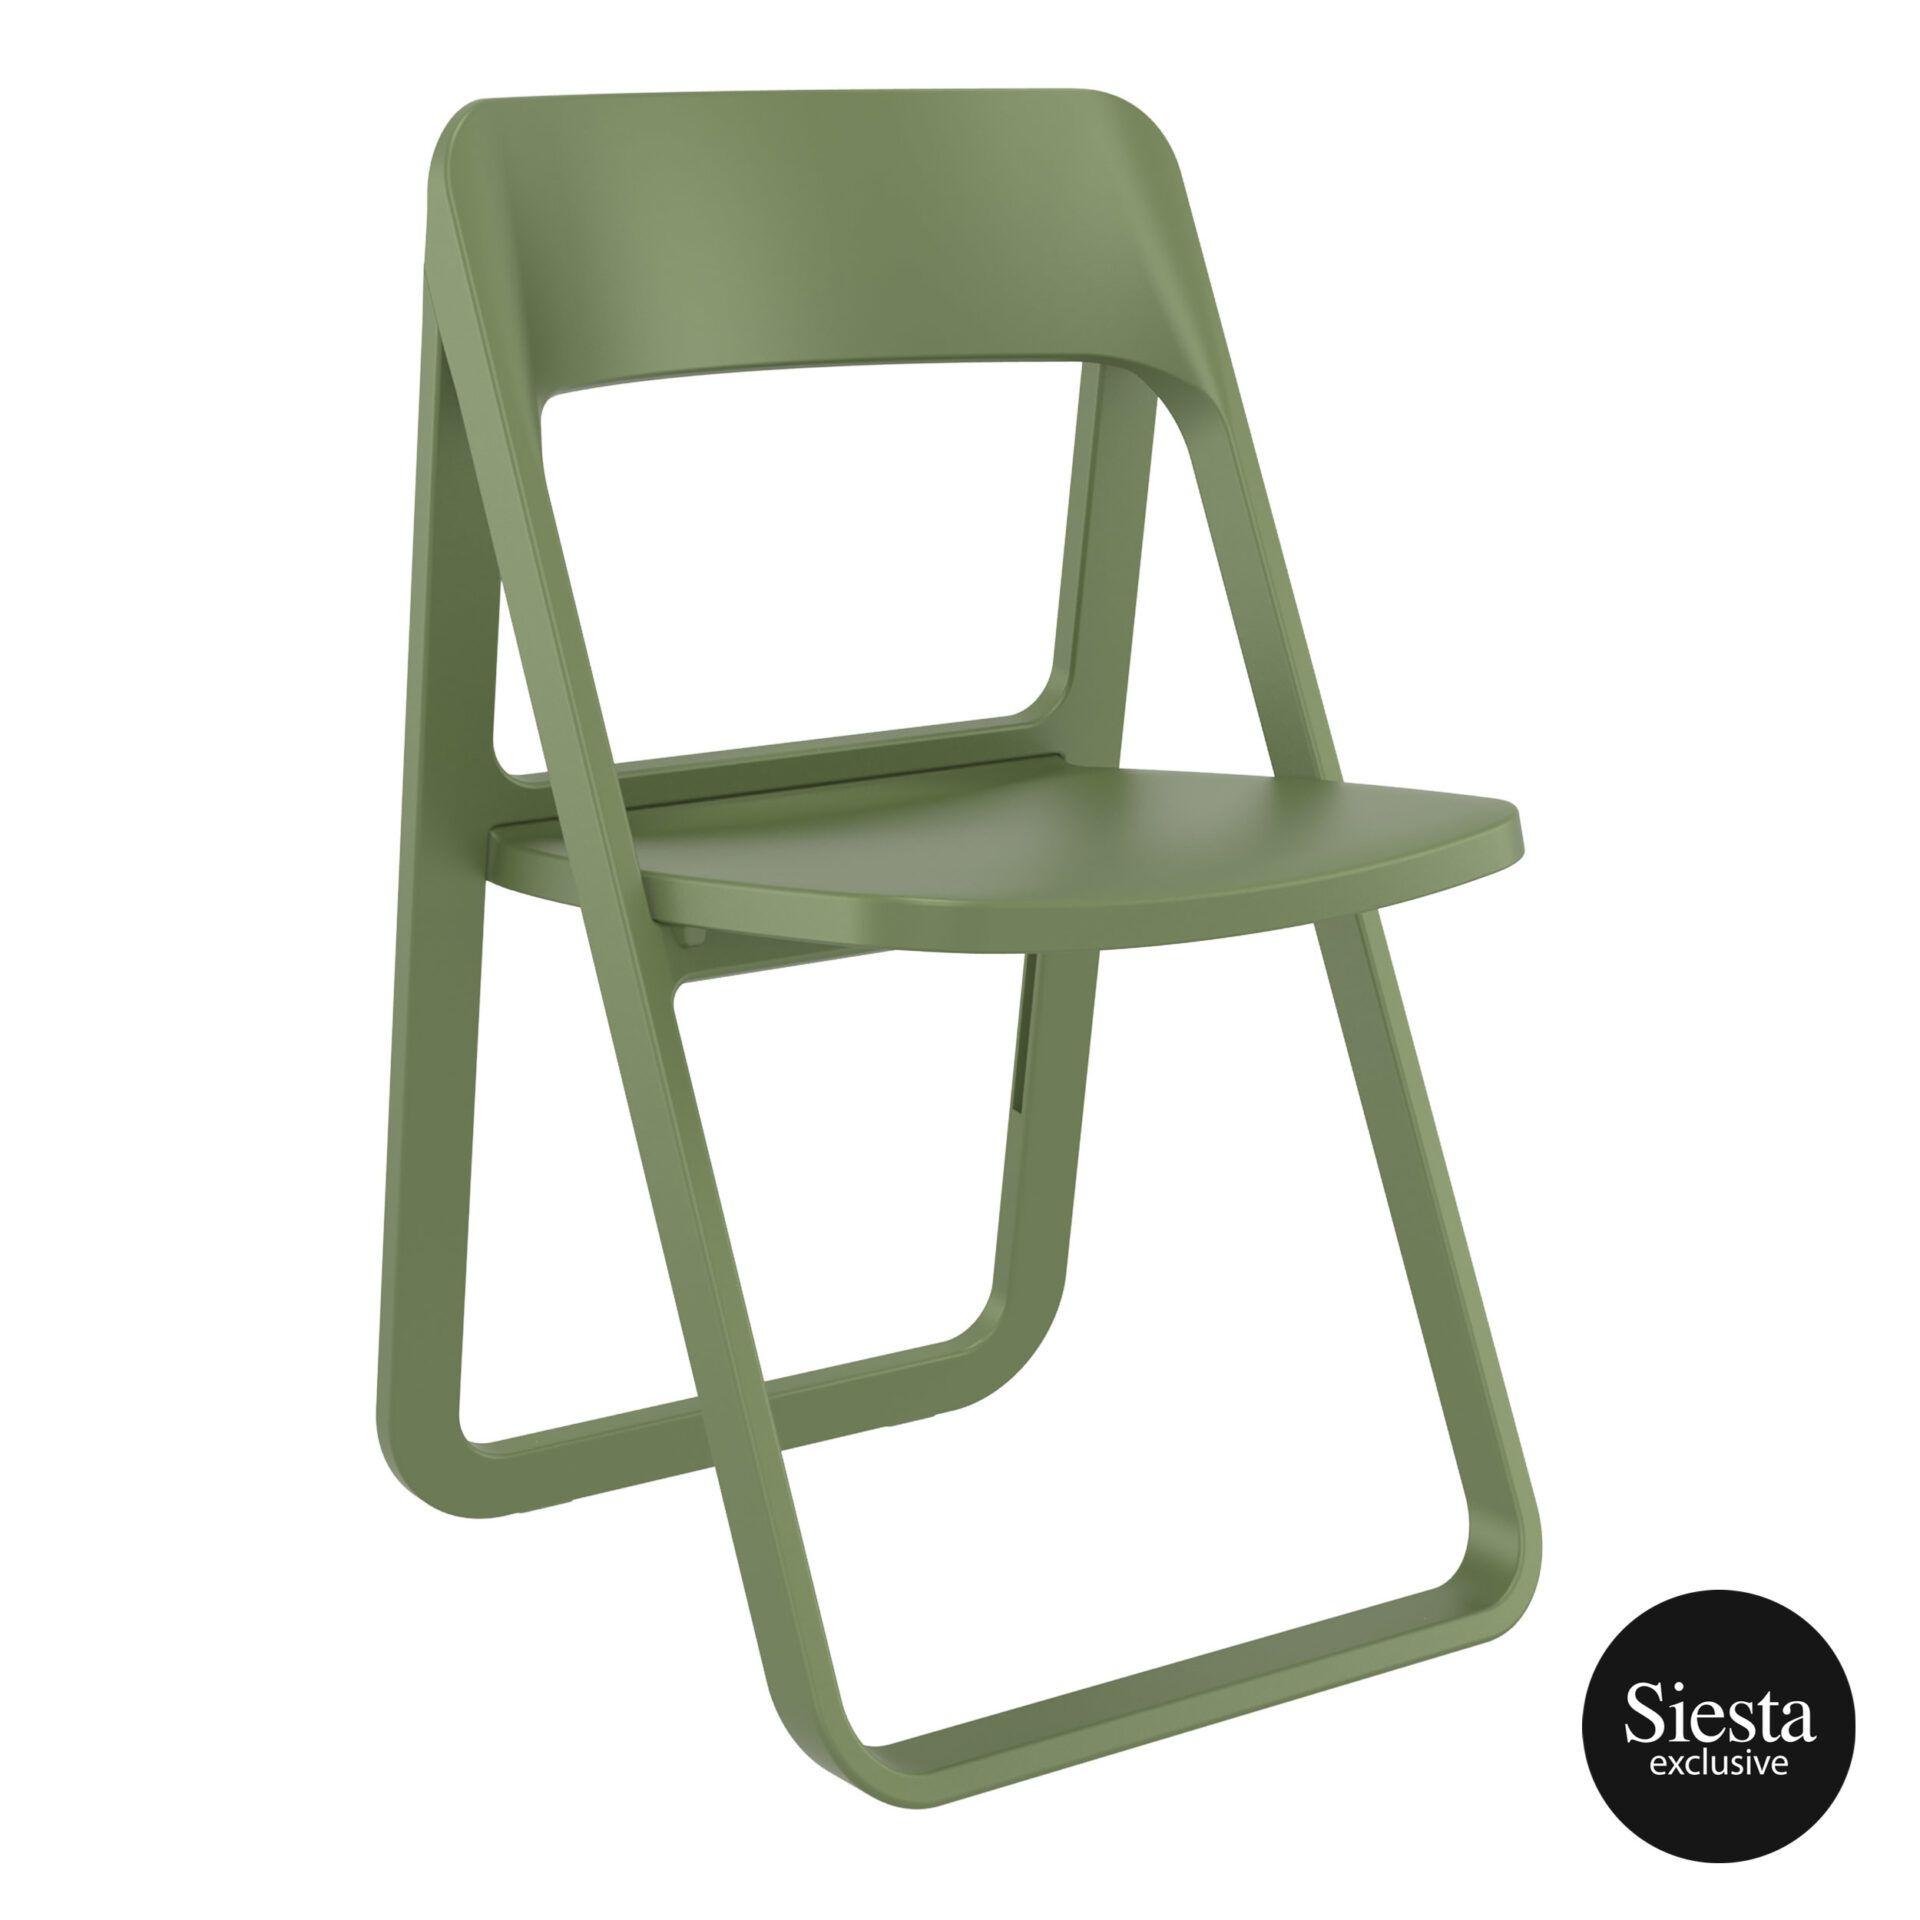 polypropylene dream folding chair olive green front side 1